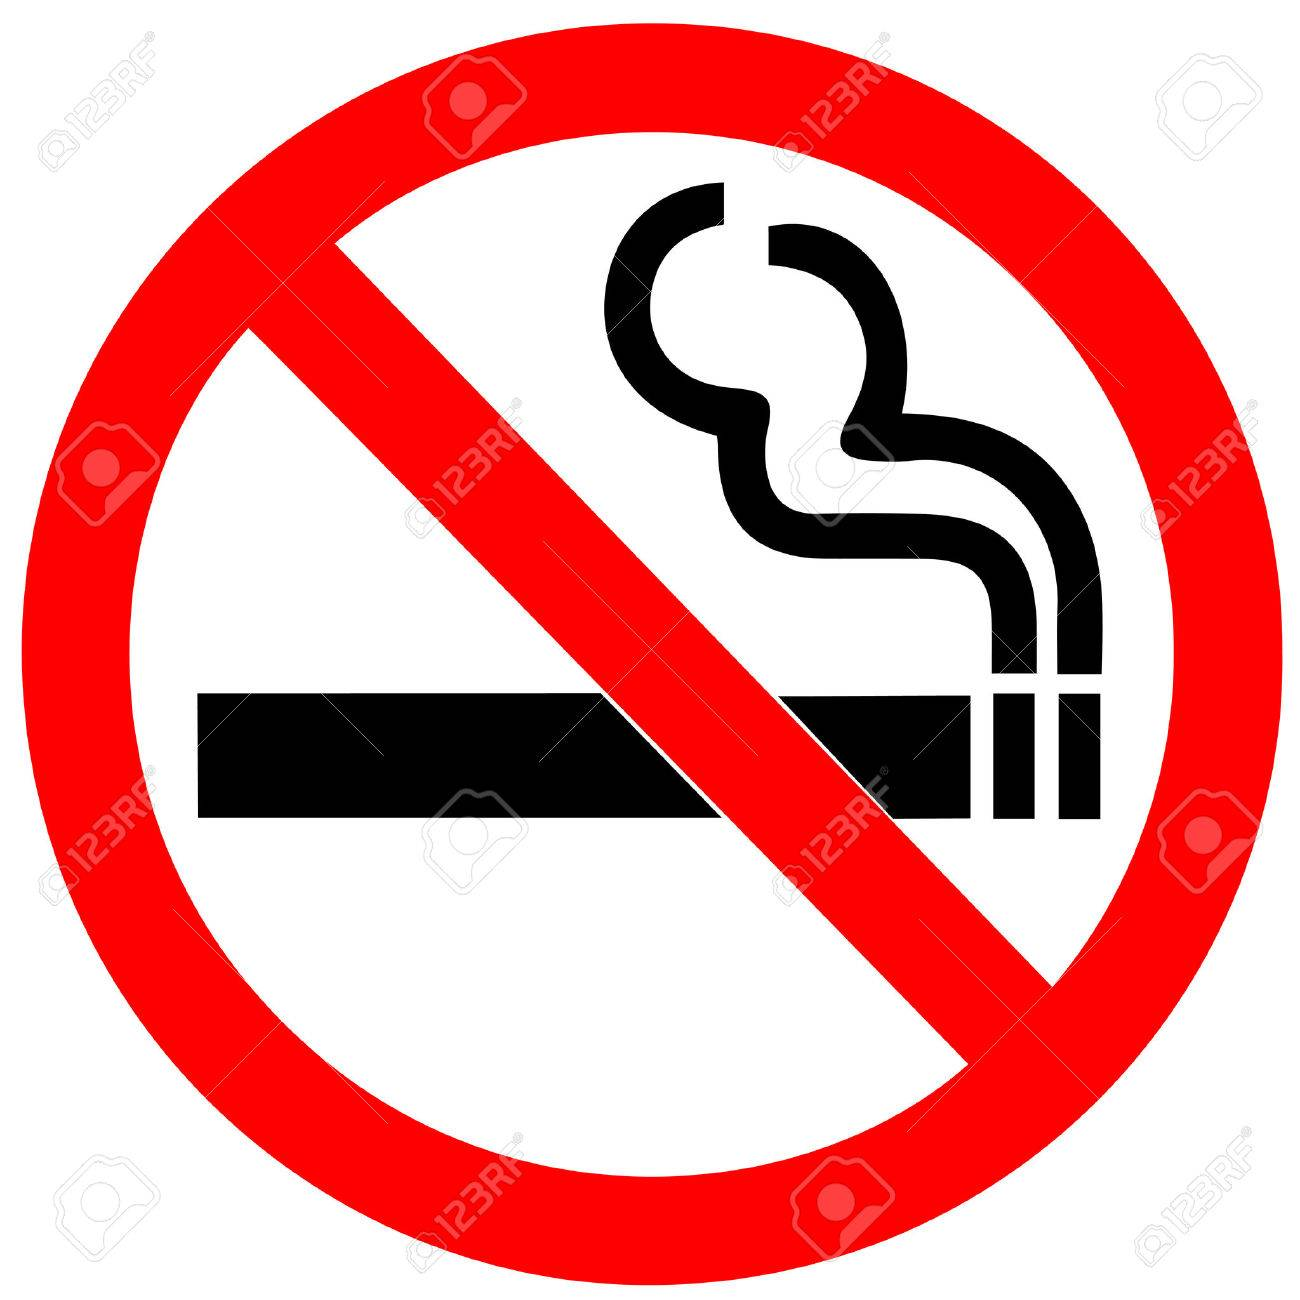 no smoking sign on white background royalty free cliparts vectors rh 123rf com no smoking vector image no smoking vector logo